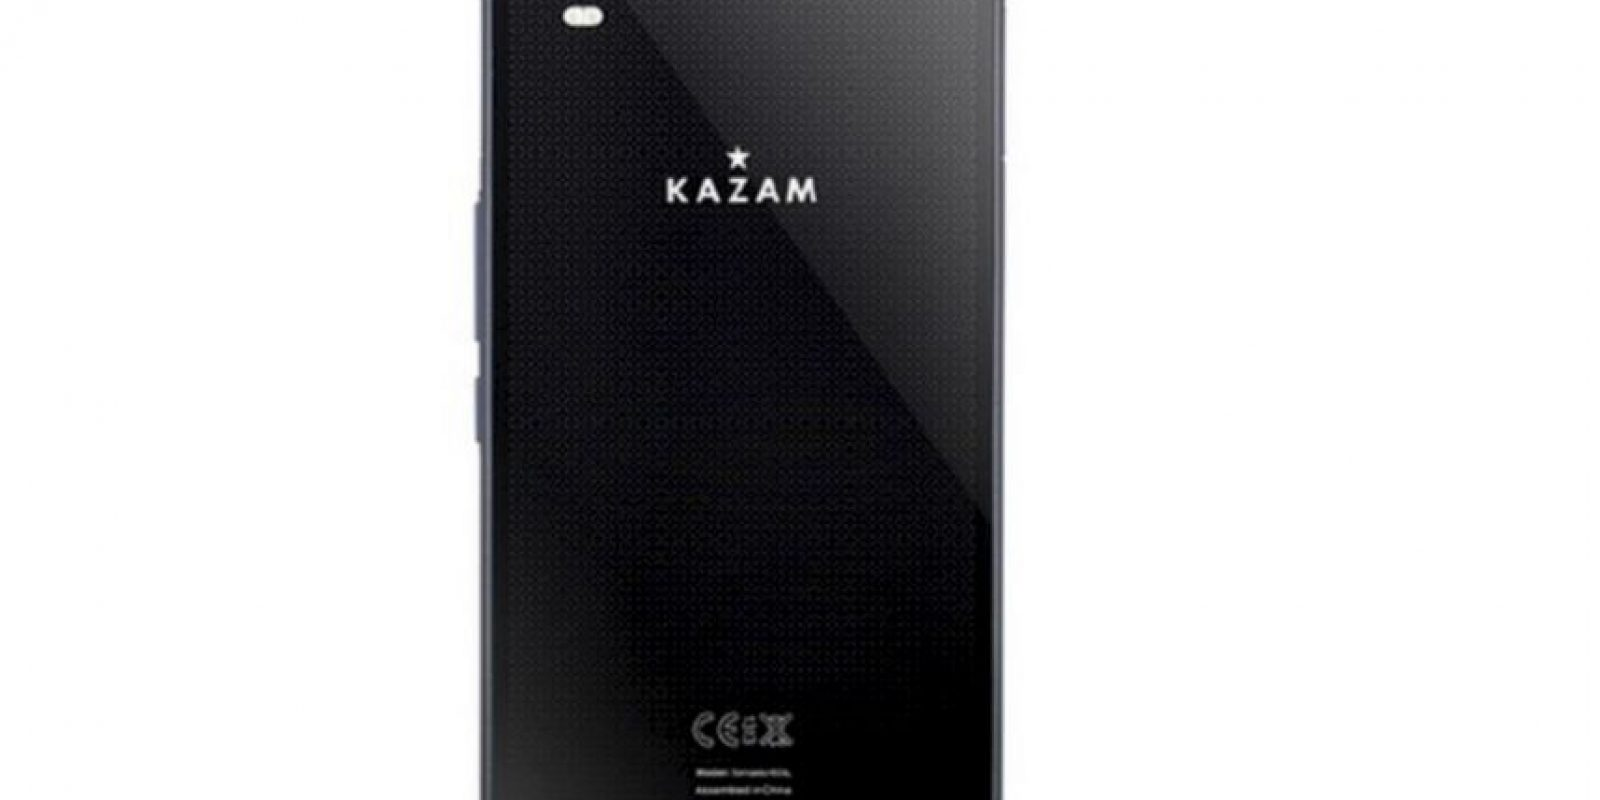 Tiene una pantalla Full HD de 5.5 pulgadas, cámara posterior de 13 megapixeles, Android 4.4 KitKat, memoria de 2.600 mAh, además de resistencia al agua (IP67). Foto:Kazam